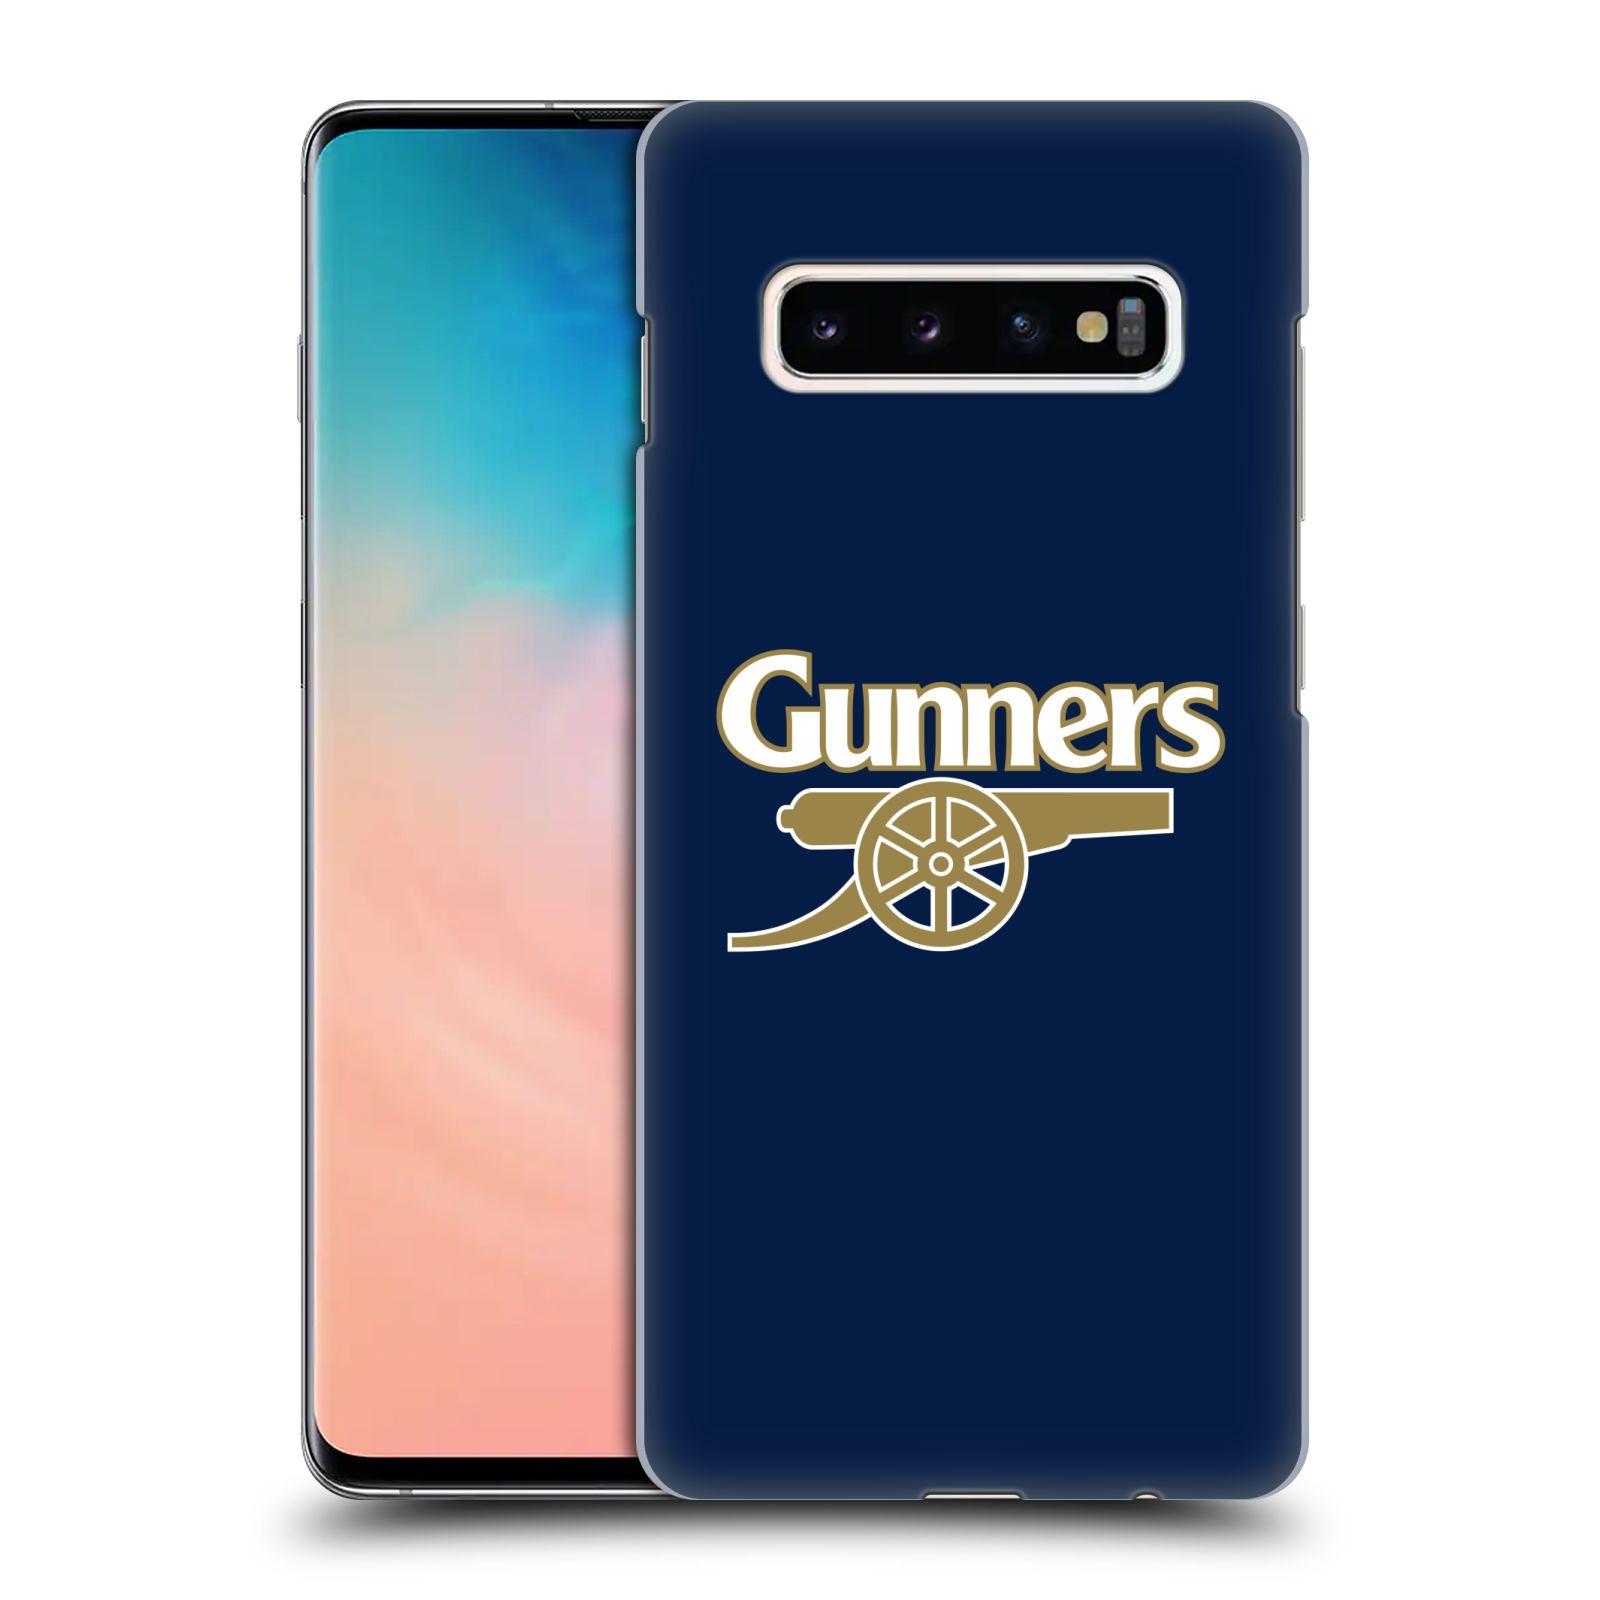 Plastové pouzdro na mobil Samsung Galaxy S10 Plus - Head Case - Arsenal FC - Gunners